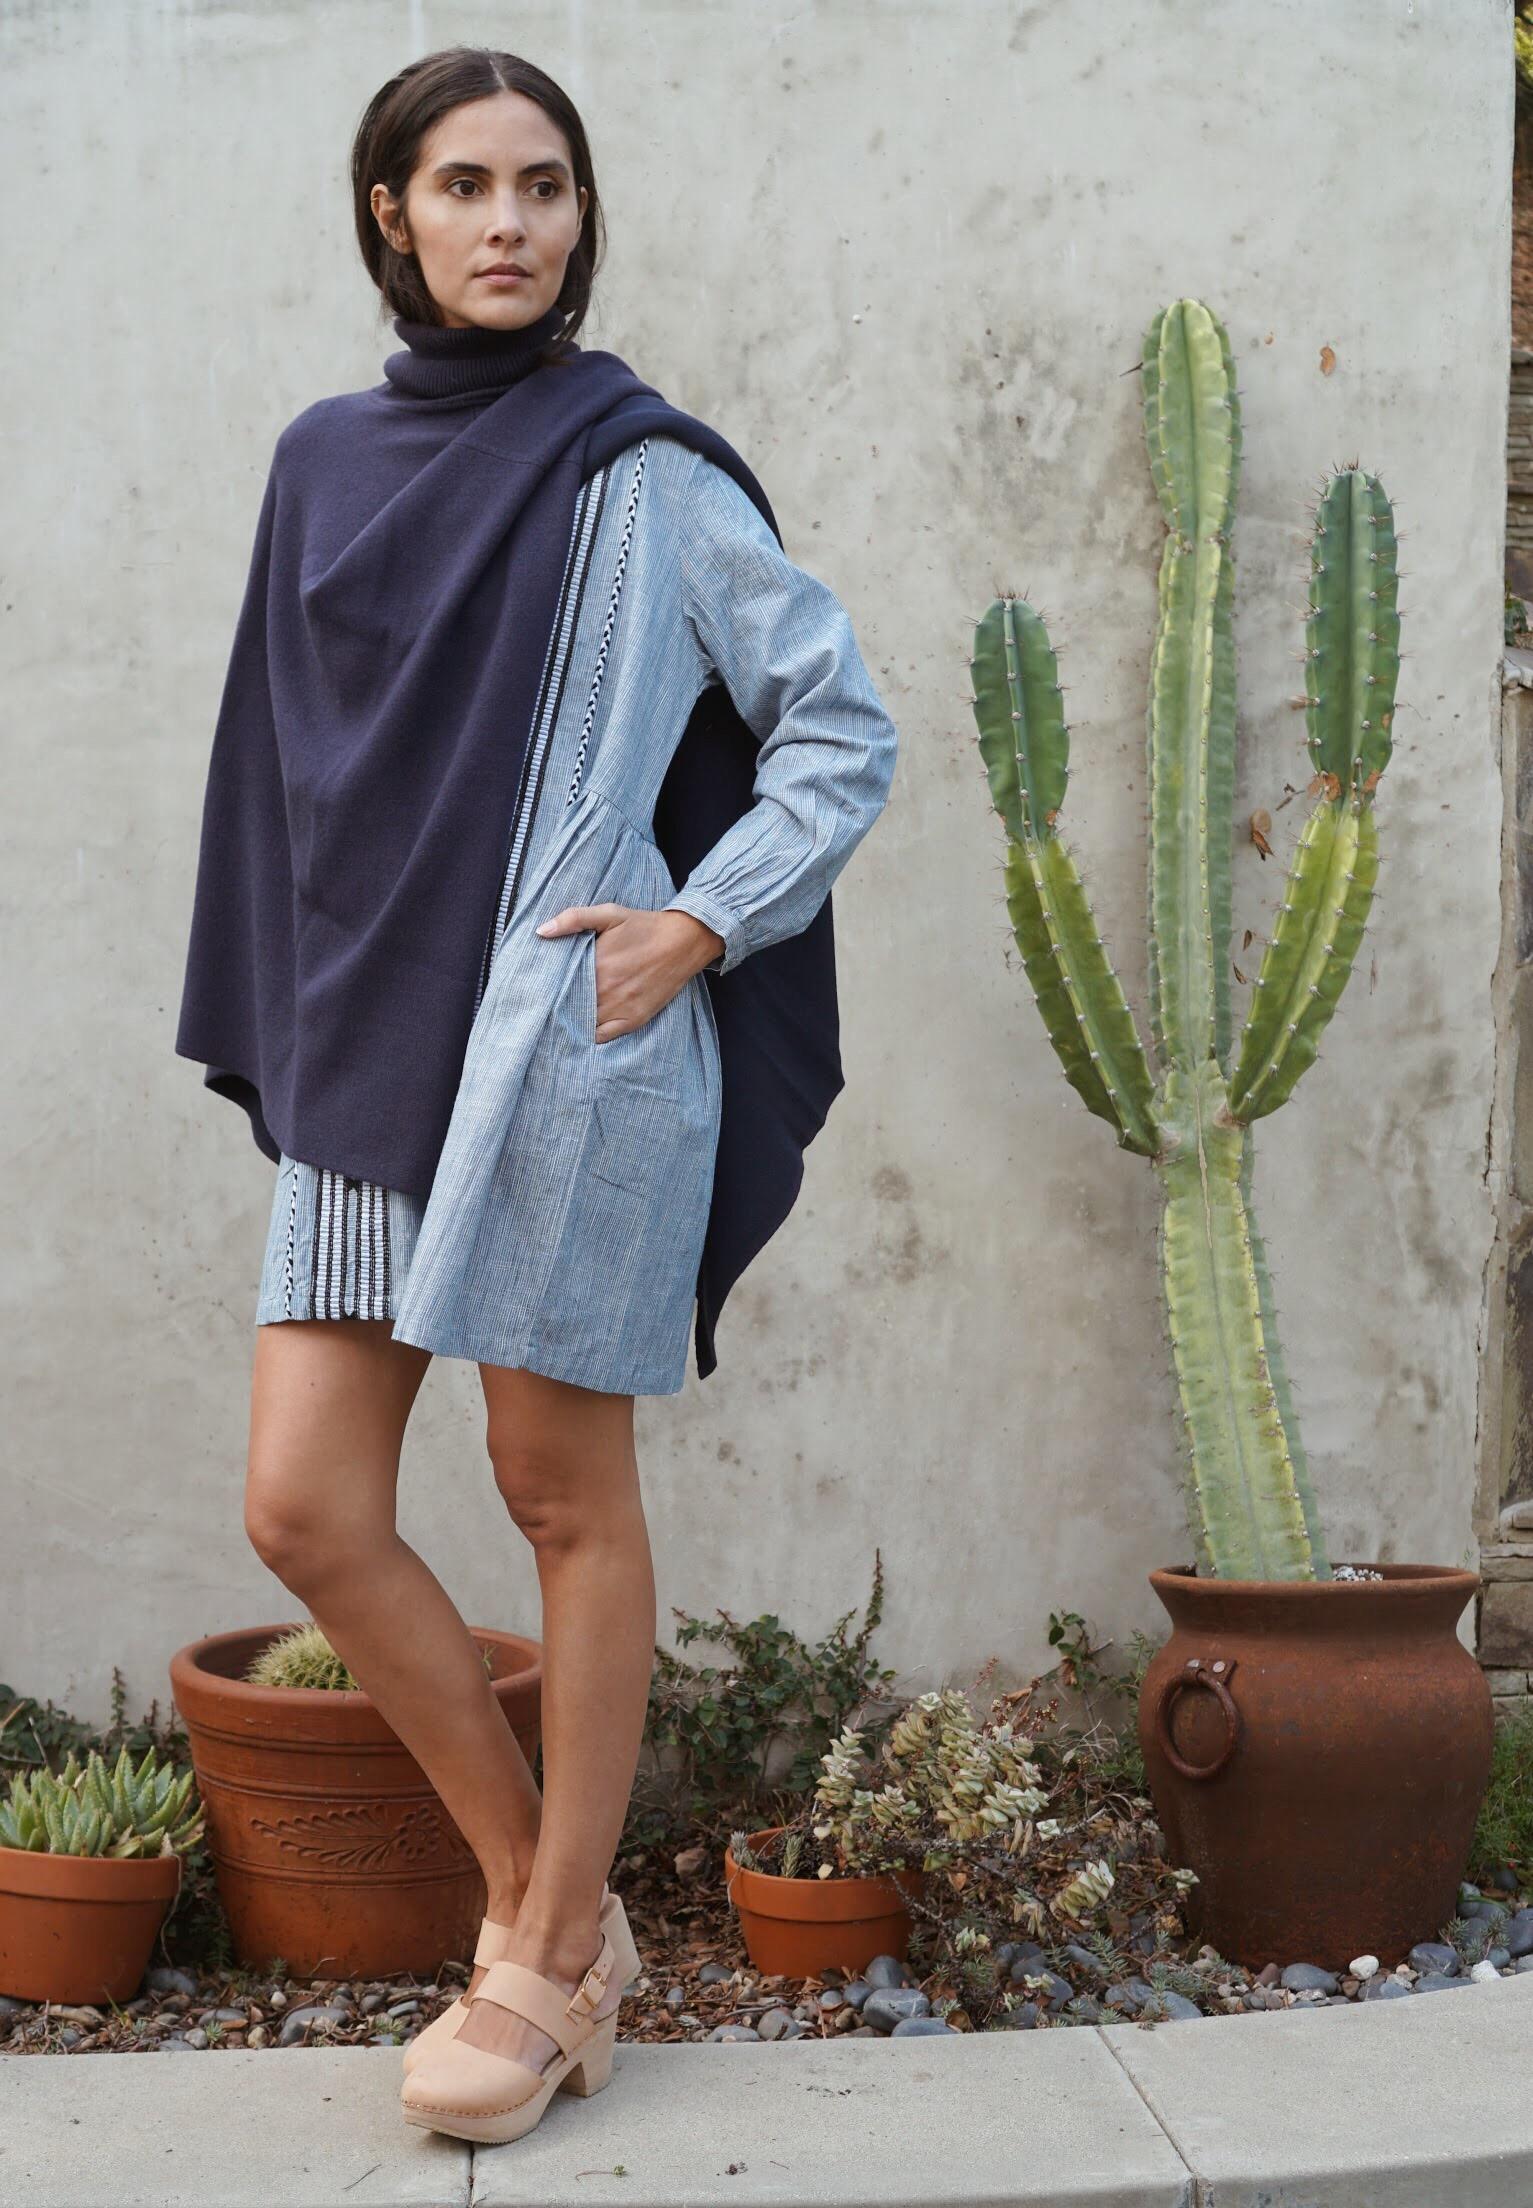 Kopal  Riya Dress in Indigo Stripe +  Maiyet  Double Knit Cape in Navy +   Zuzii   Closed Toe Clogs in Natural.